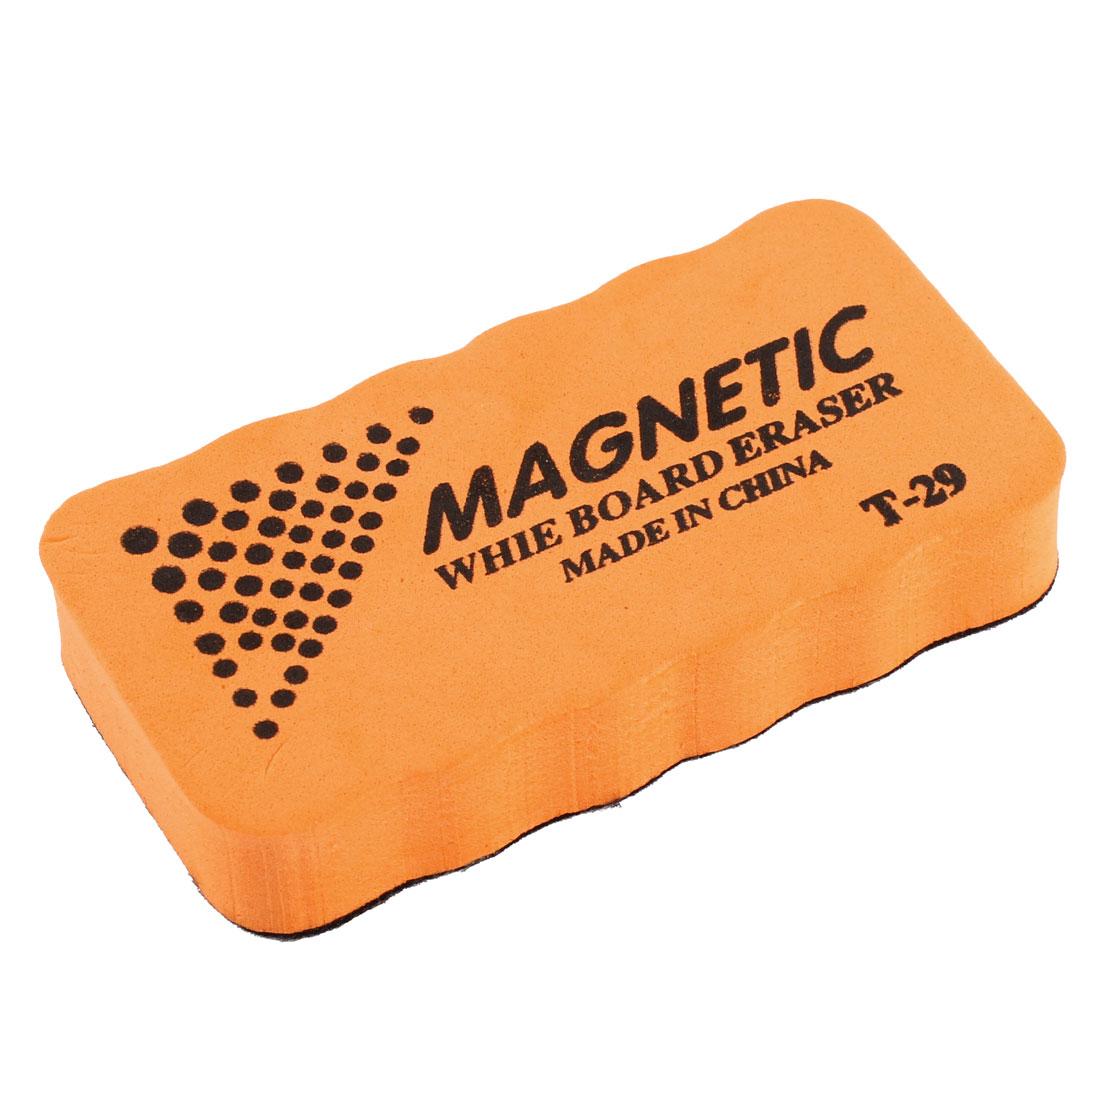 Orange Rectangle Magnetic Dry Wipe Whiteboard Eraser Marker Cleaner for School Office